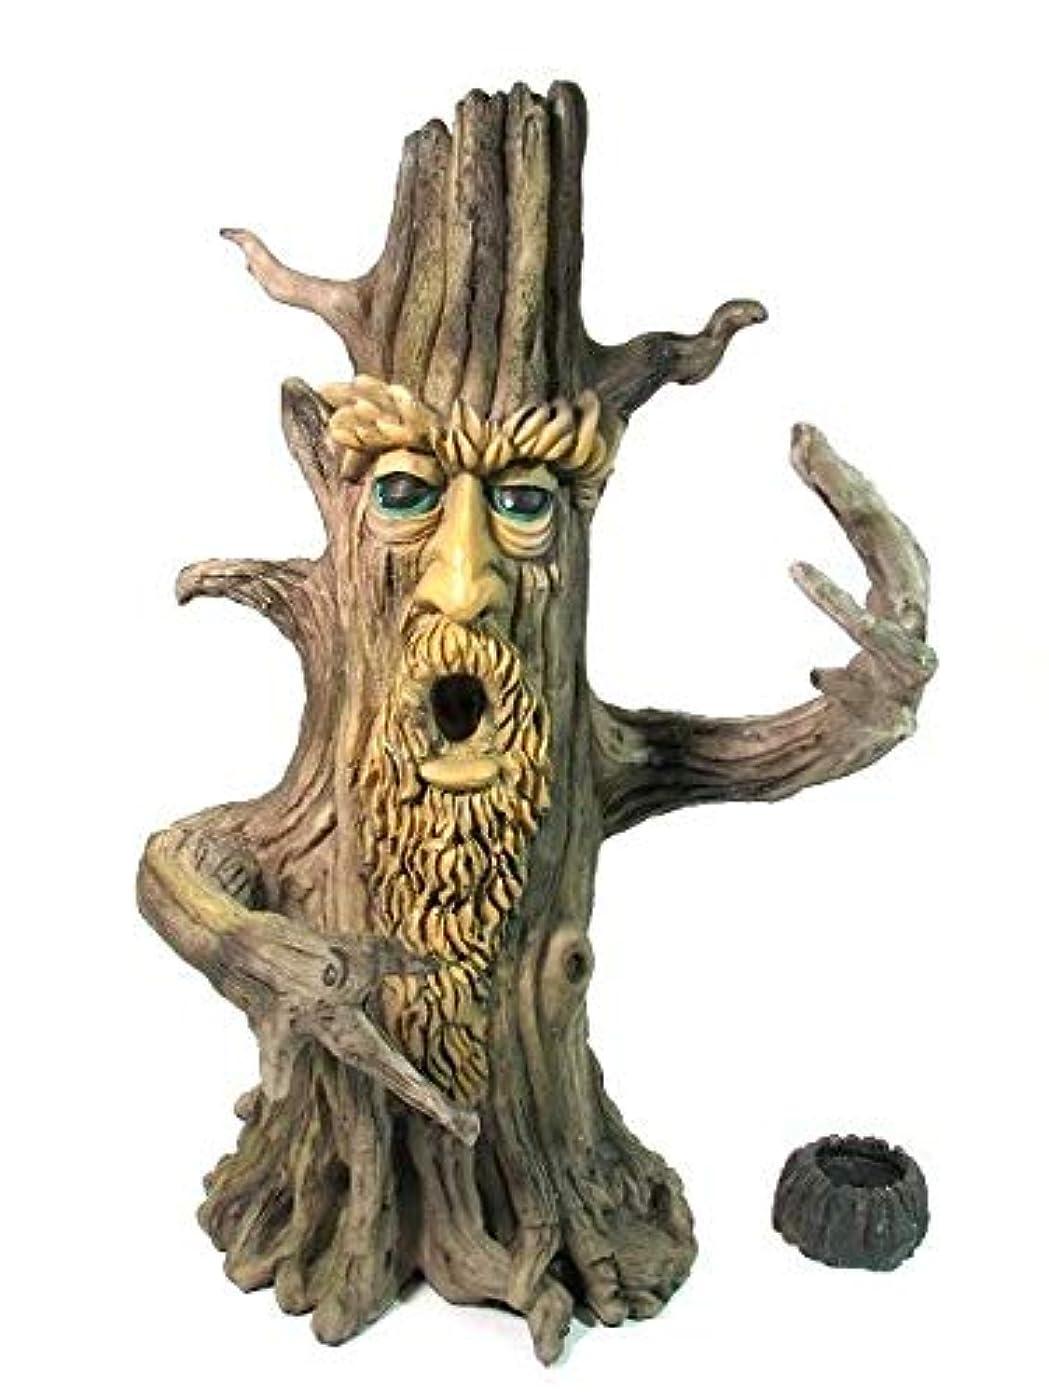 [INCENSE GOODS(インセンスグッズ)] TREE MAN INCENSE BURNER 木の精香立